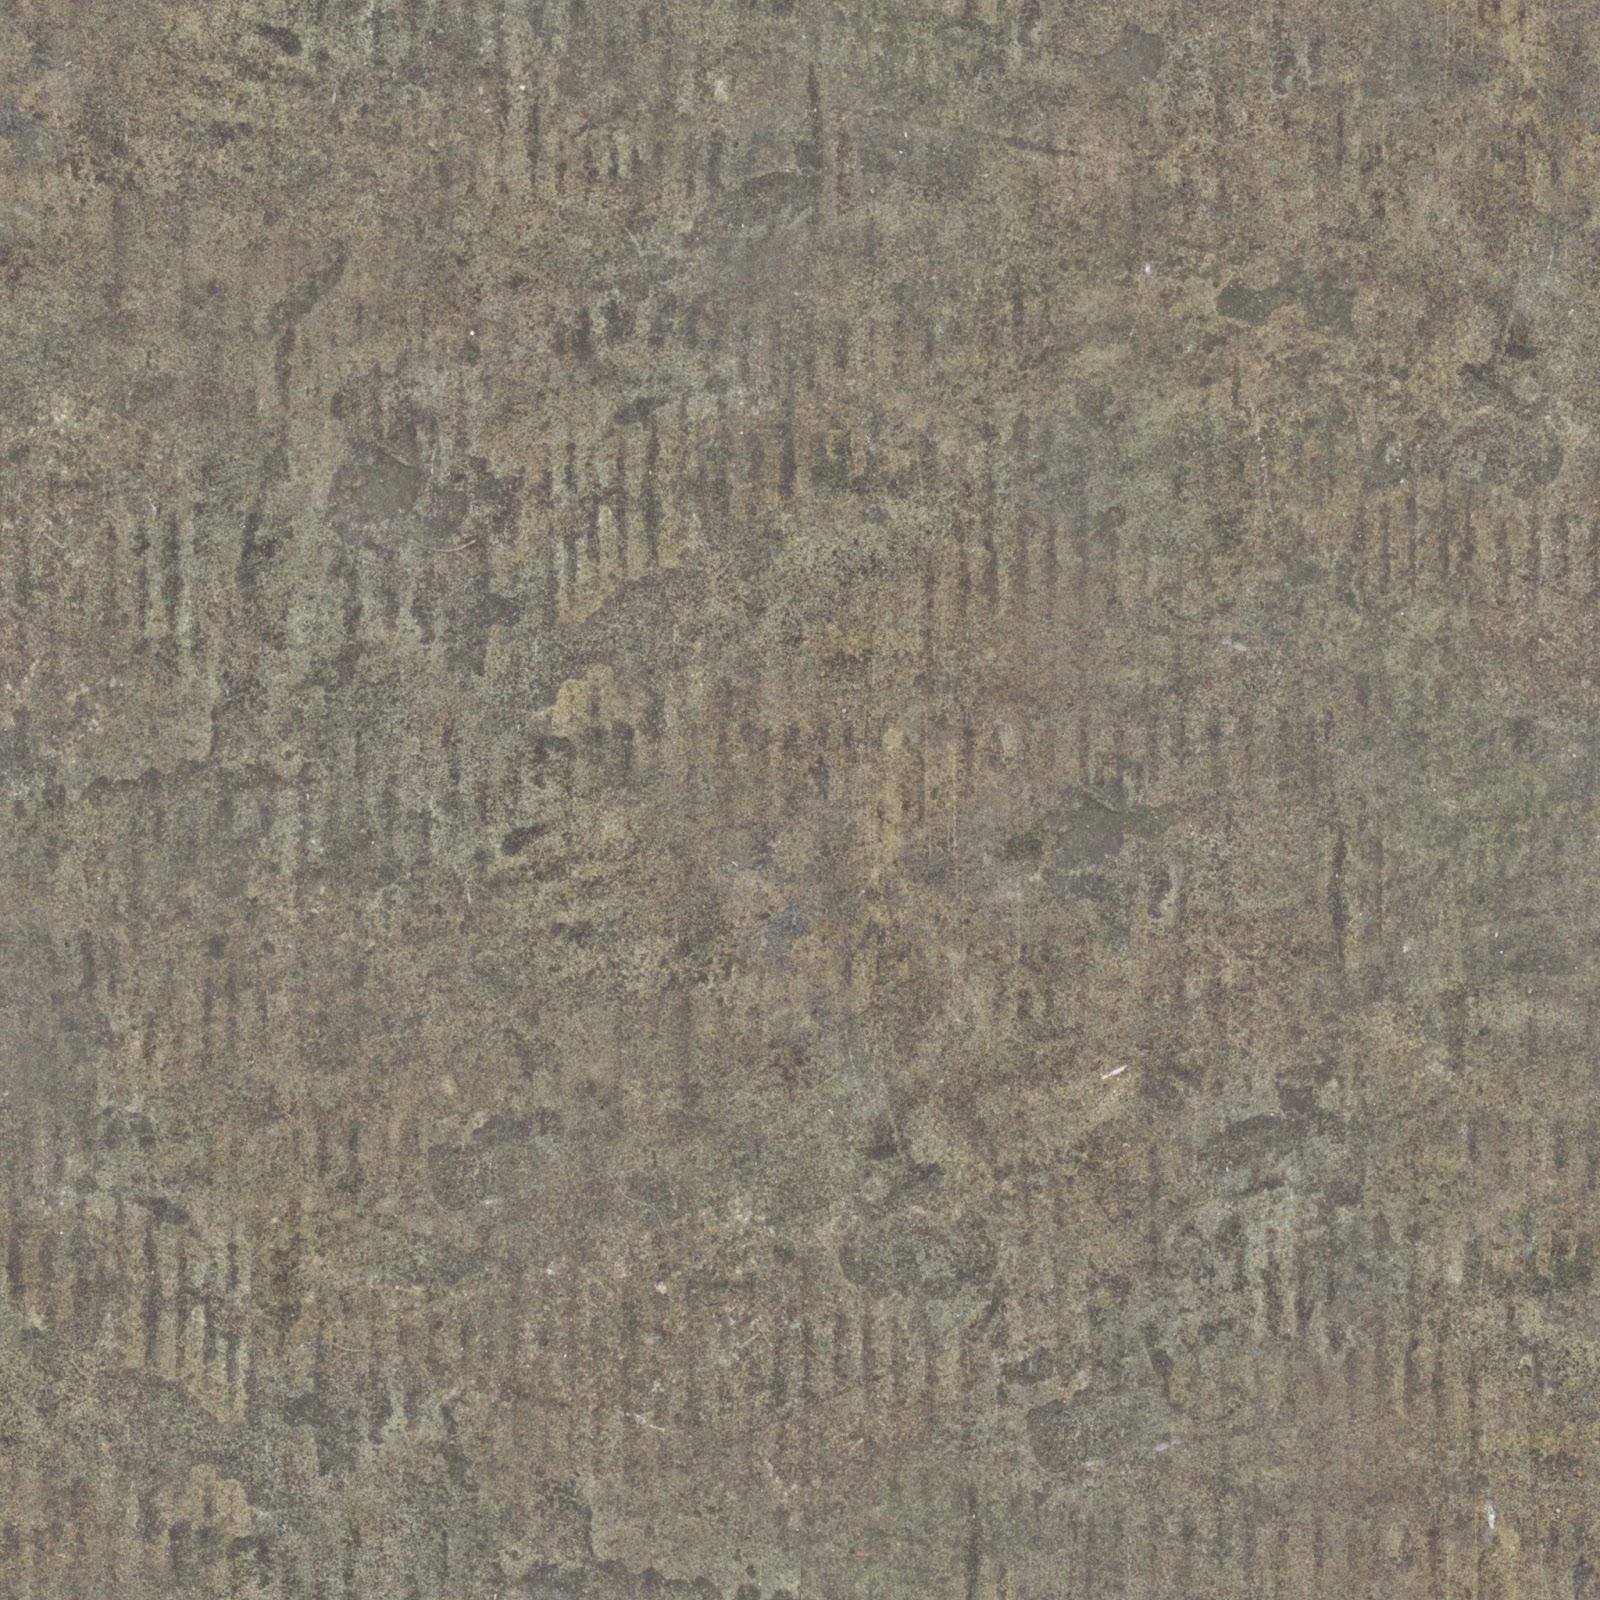 (Stone 11) rock cave mountain brown seamless texture 2048x2048